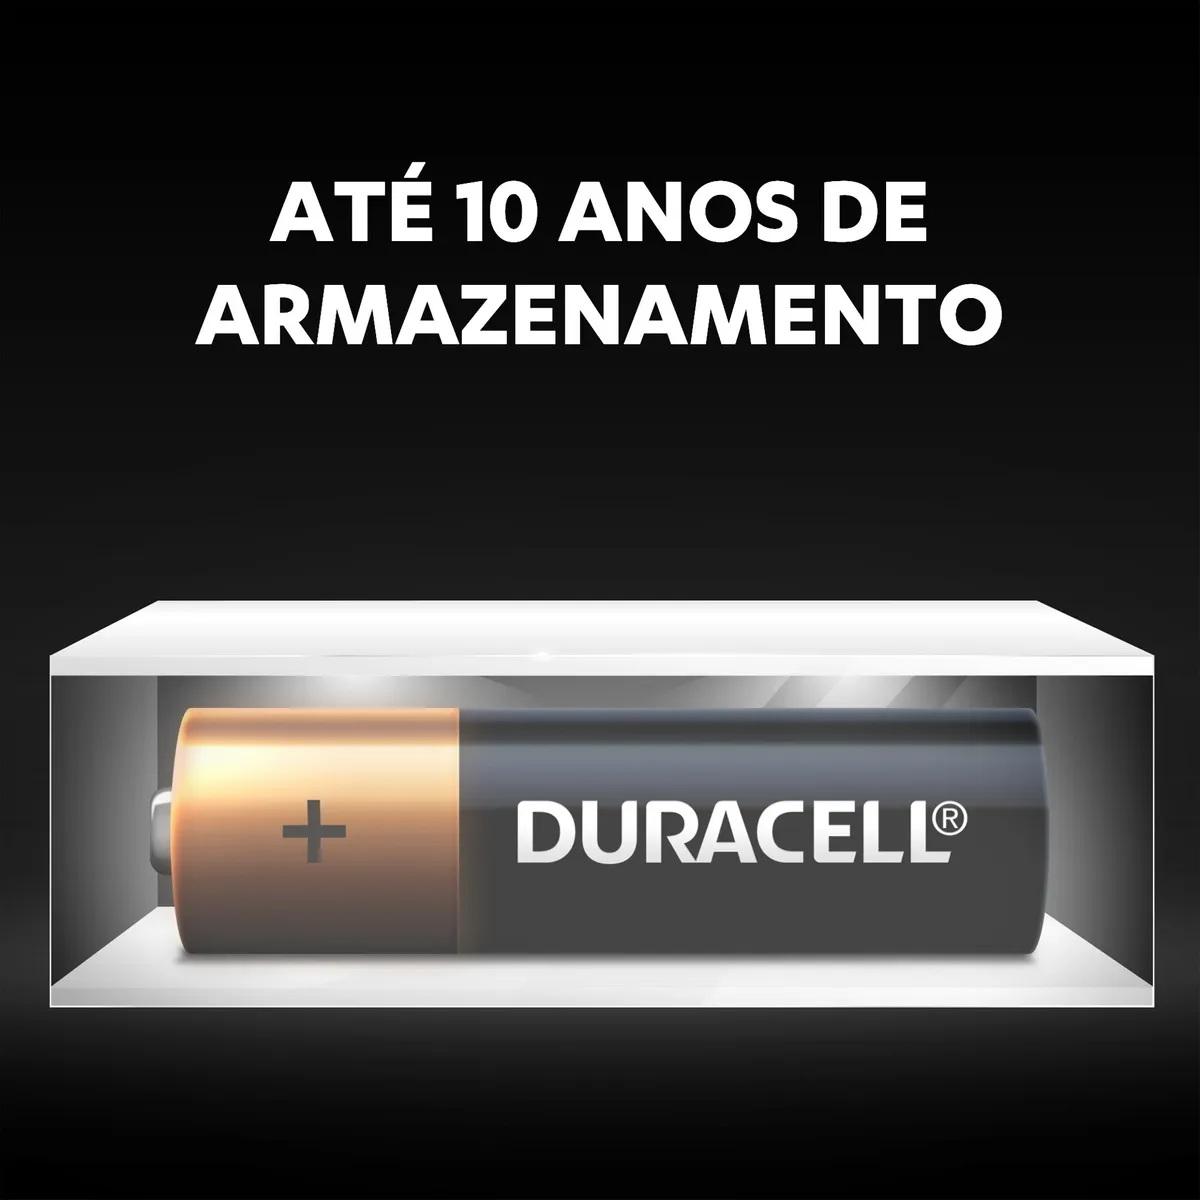 Pilha Duracell Alcalina Palito Aaa Econopack Com 16 Unidades